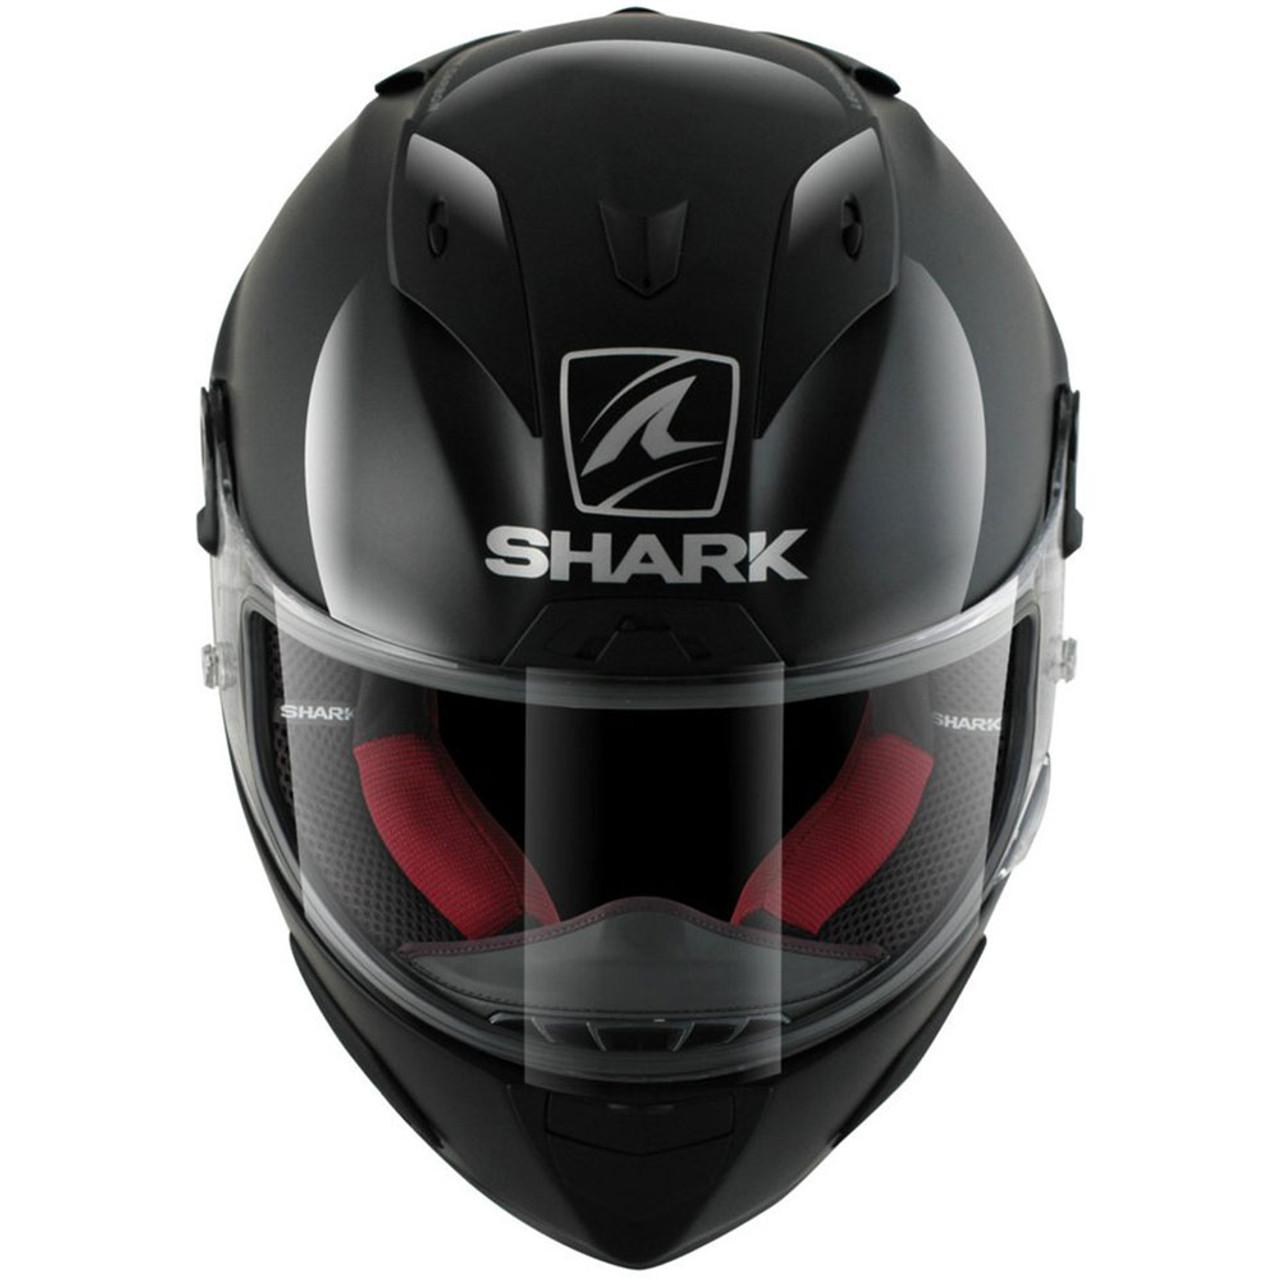 9466b74ba1422 Shark Race-R Pro Carbon Gloss Black Helmet - HE8670DBLKM - Get Lowered  Cycles